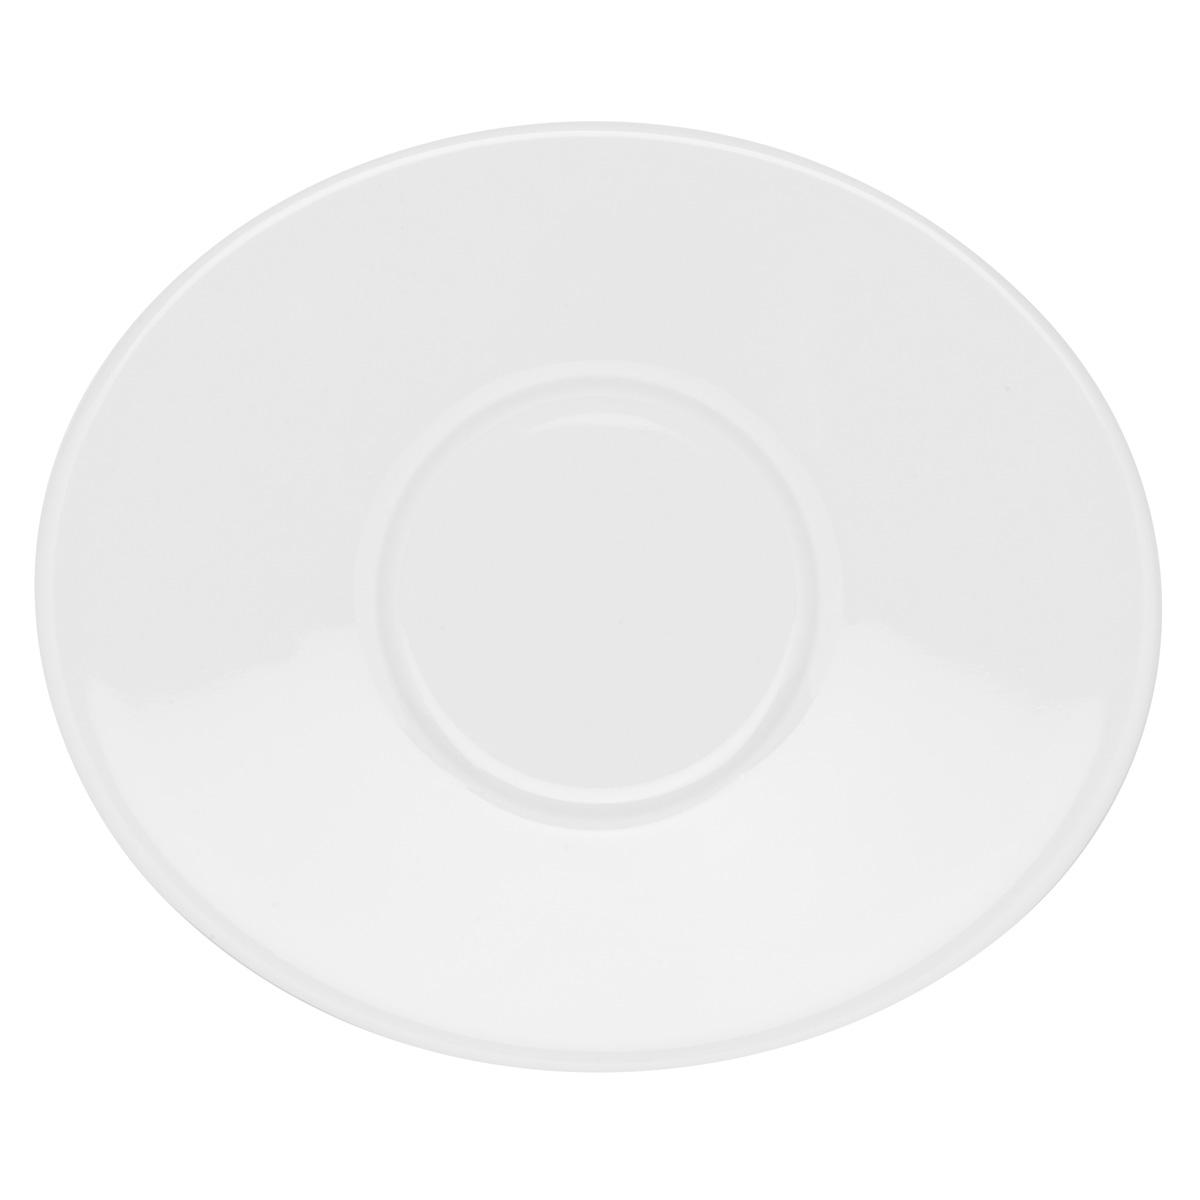 boreal blanc tasse a dejeuner 40 cl les tasses la table parisienne. Black Bedroom Furniture Sets. Home Design Ideas